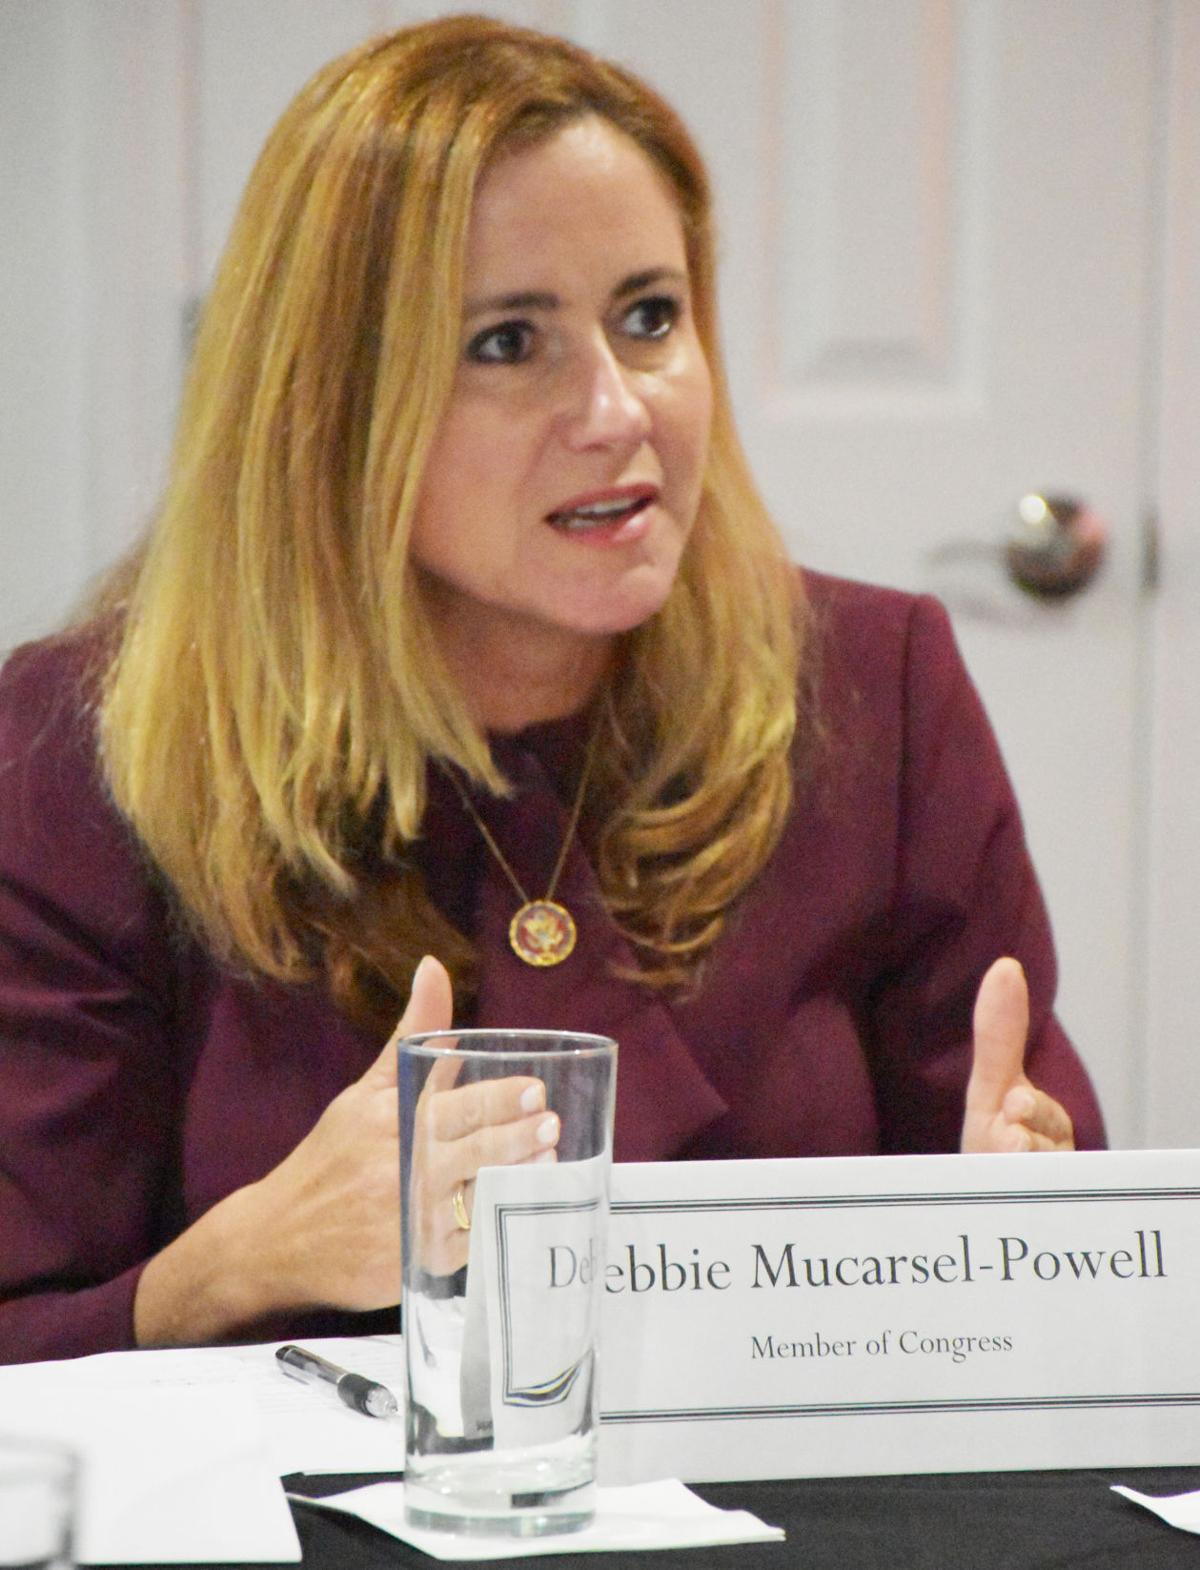 ep. Debbie Mucarsel-Powell